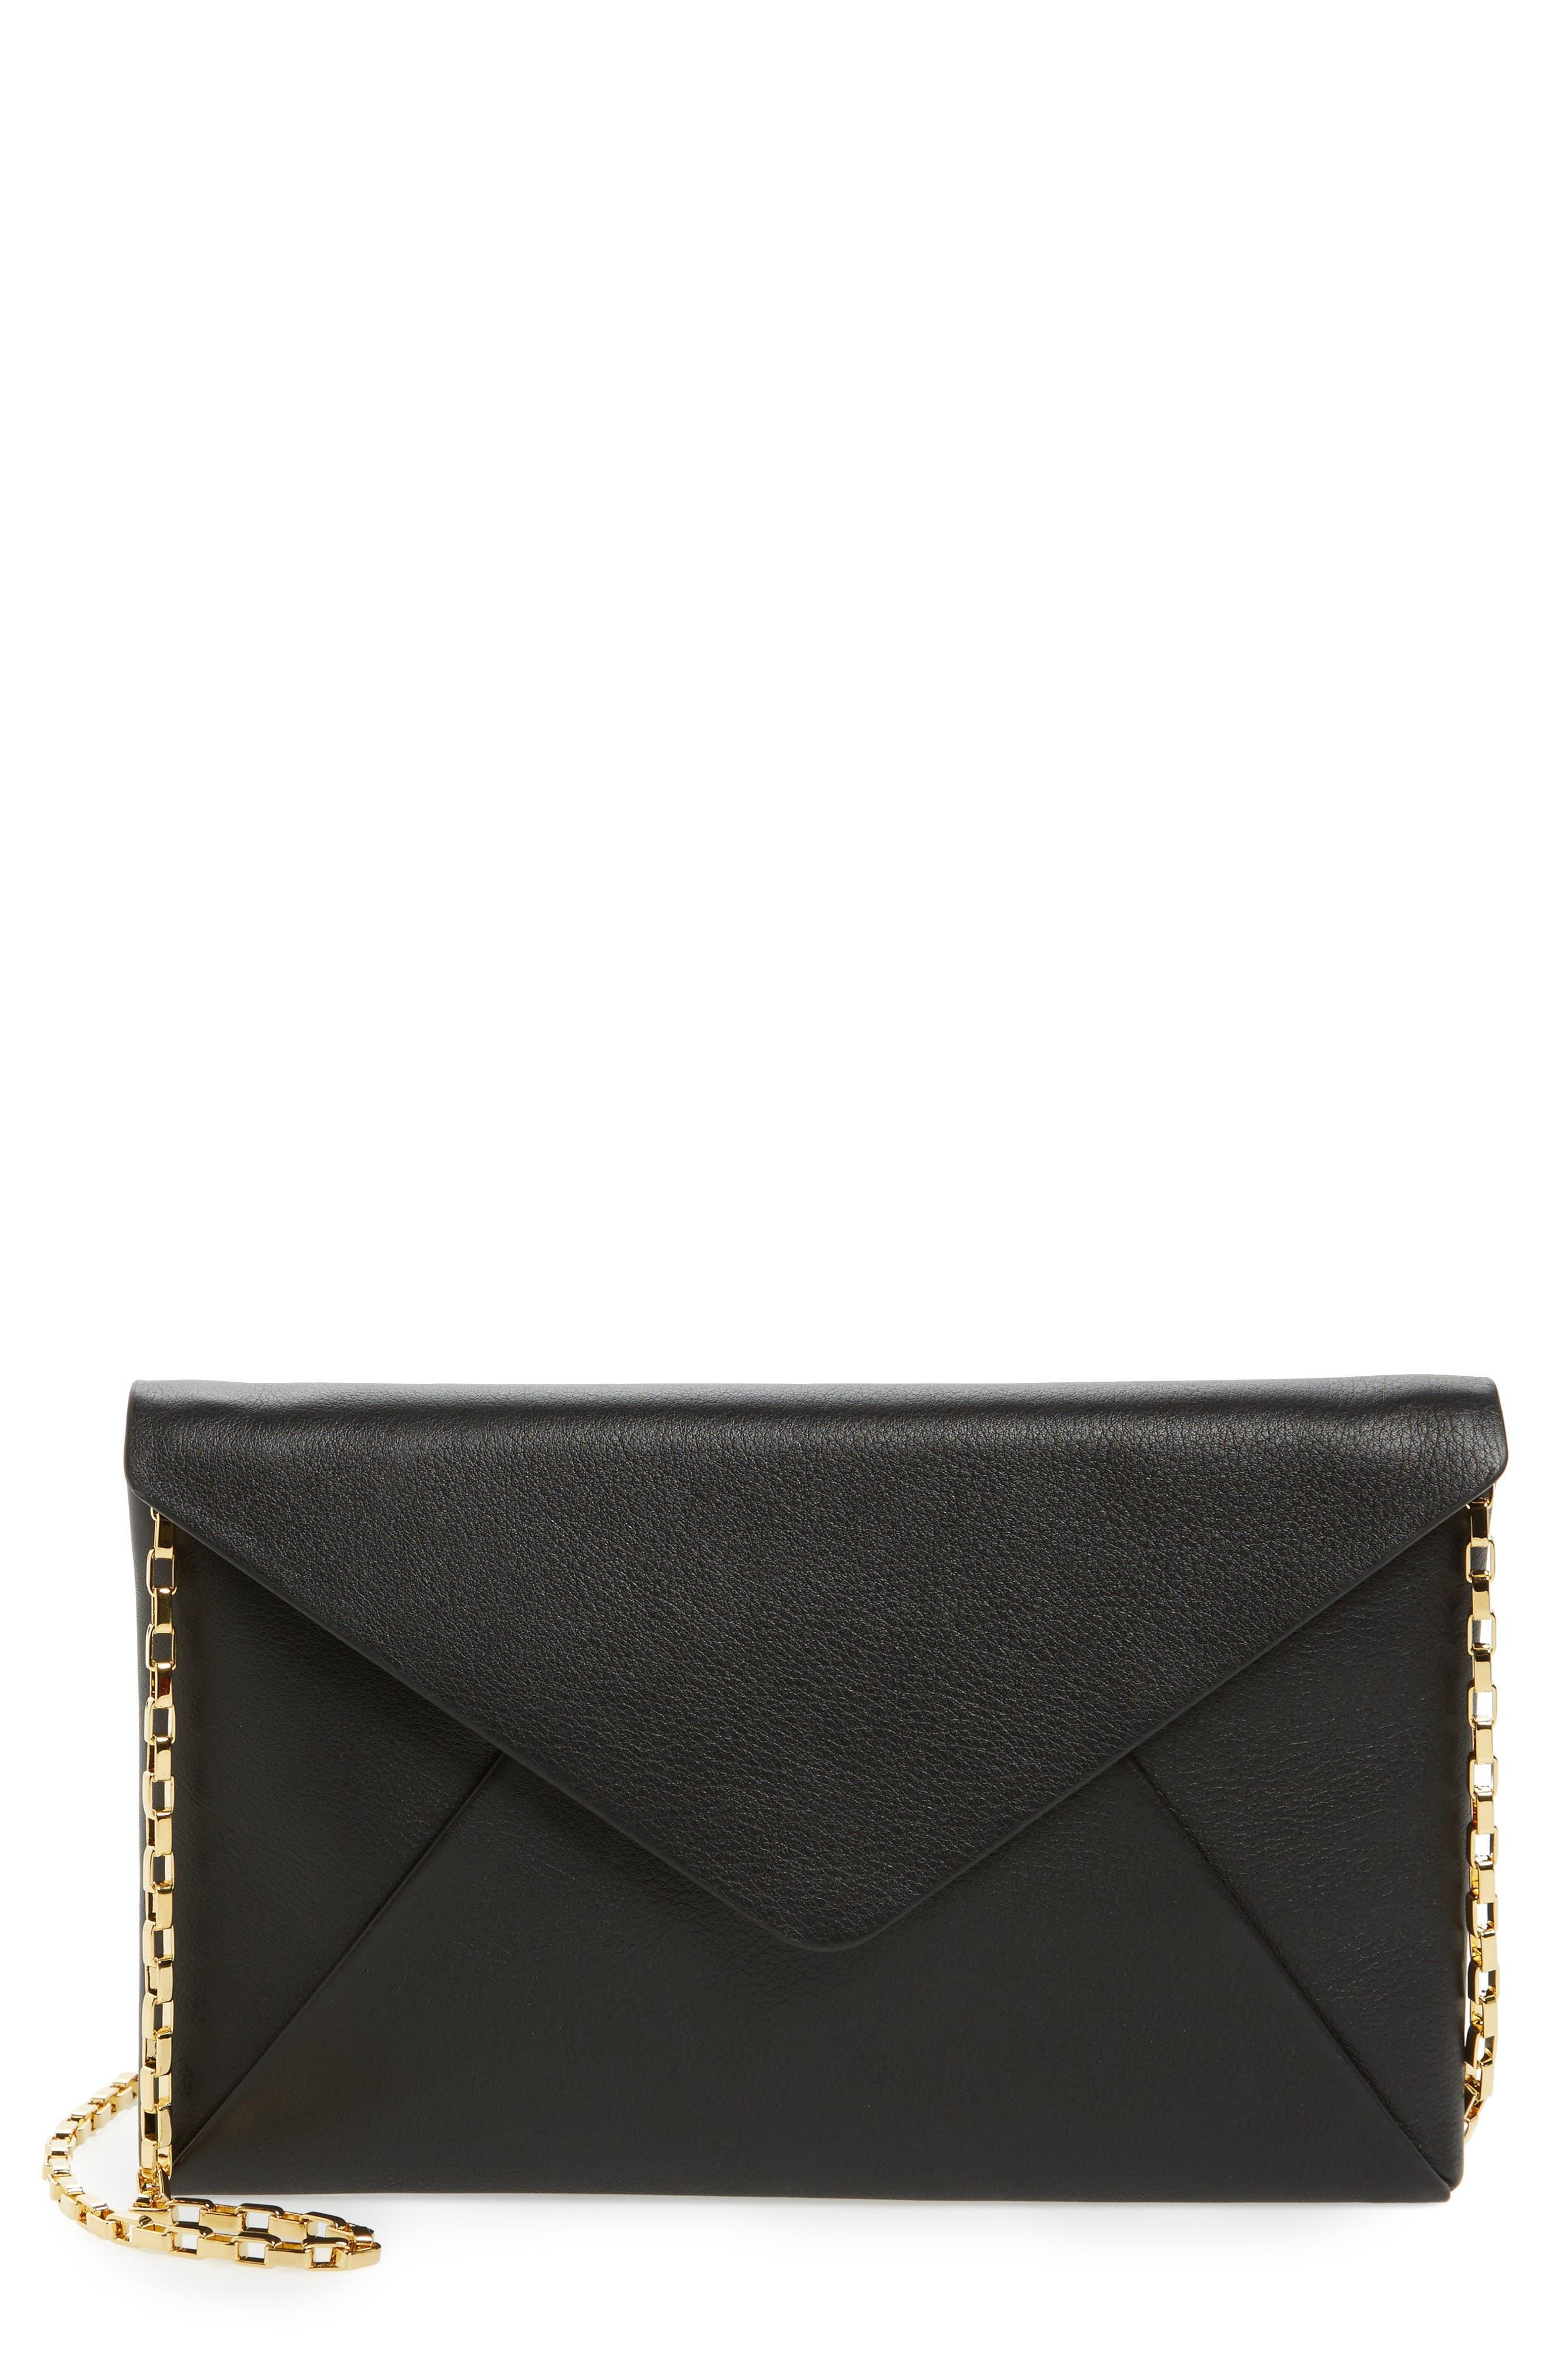 MICHAEL KORS Small Calfskin Leather Envelope Clutch